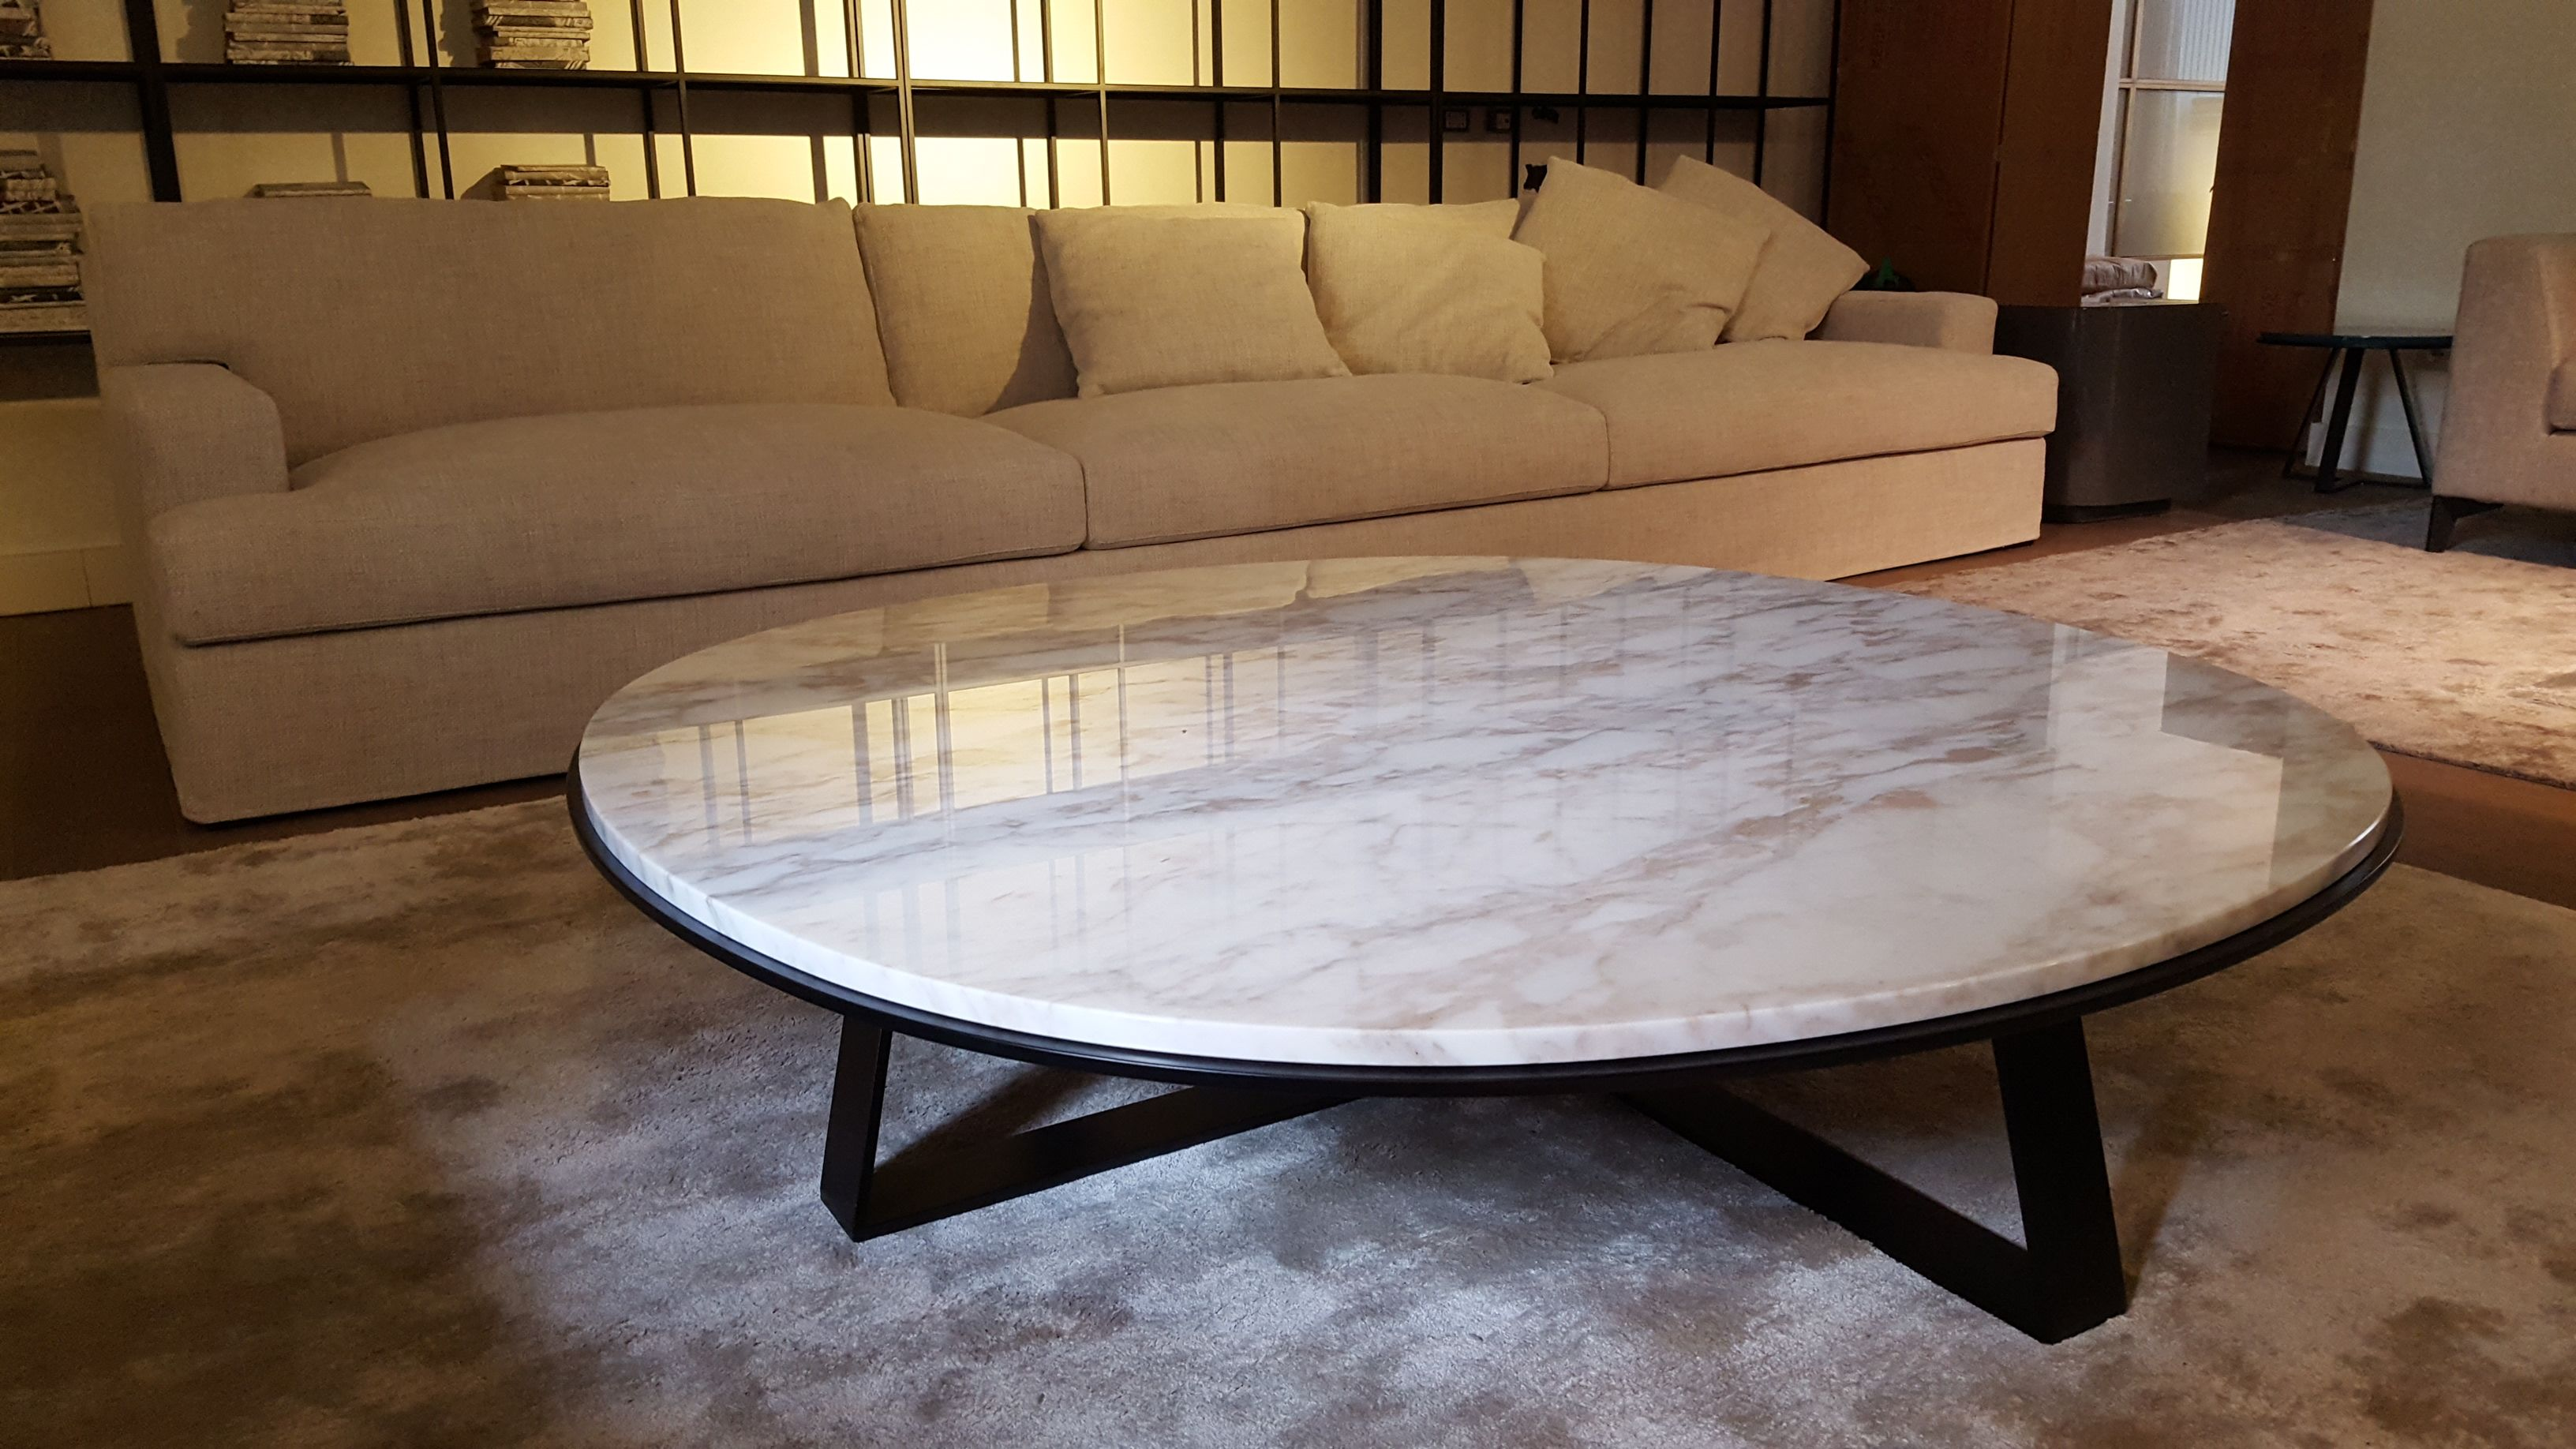 James Large Modular Sofa And Shine Judd Low Table, Calacatta Marble Top.